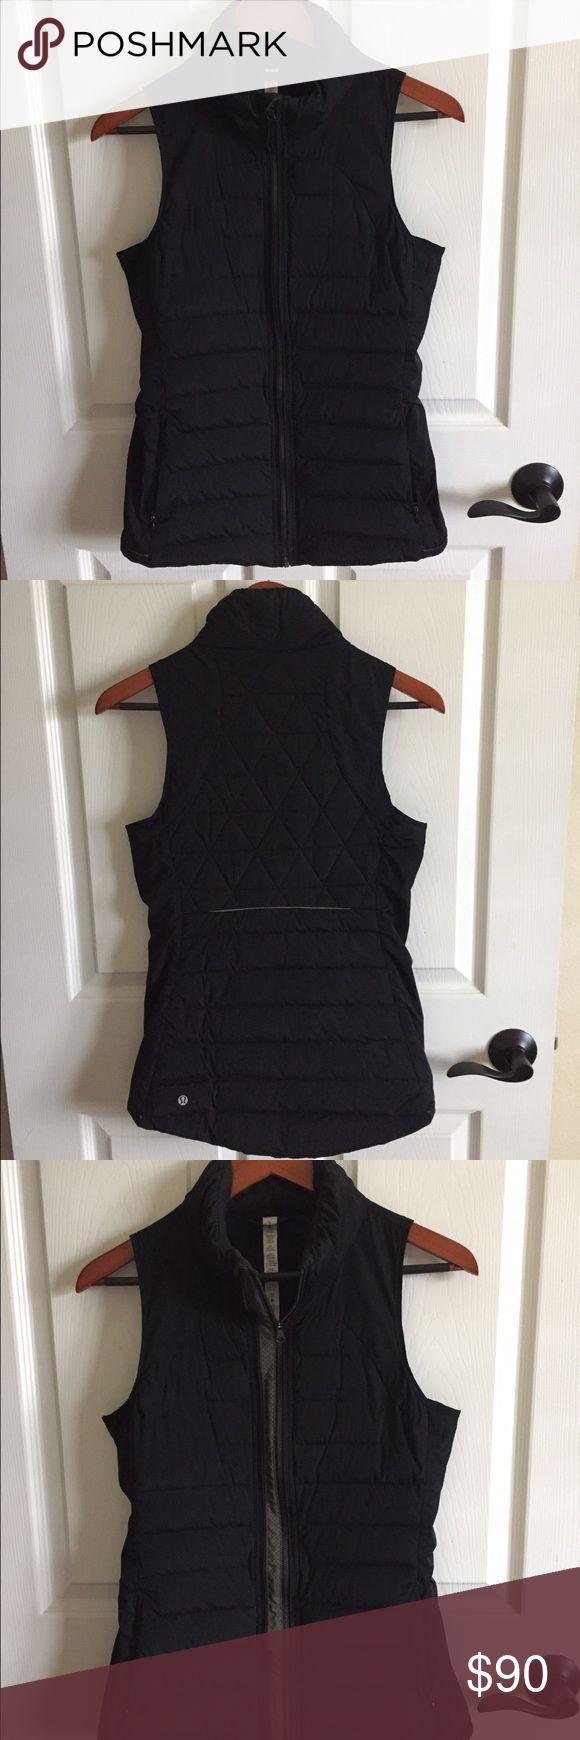 Lululemon black vest sz 6 Black lululemon vest in sz 6 with reflection. Like new. lululemon athletica Jackets & Coats Vests